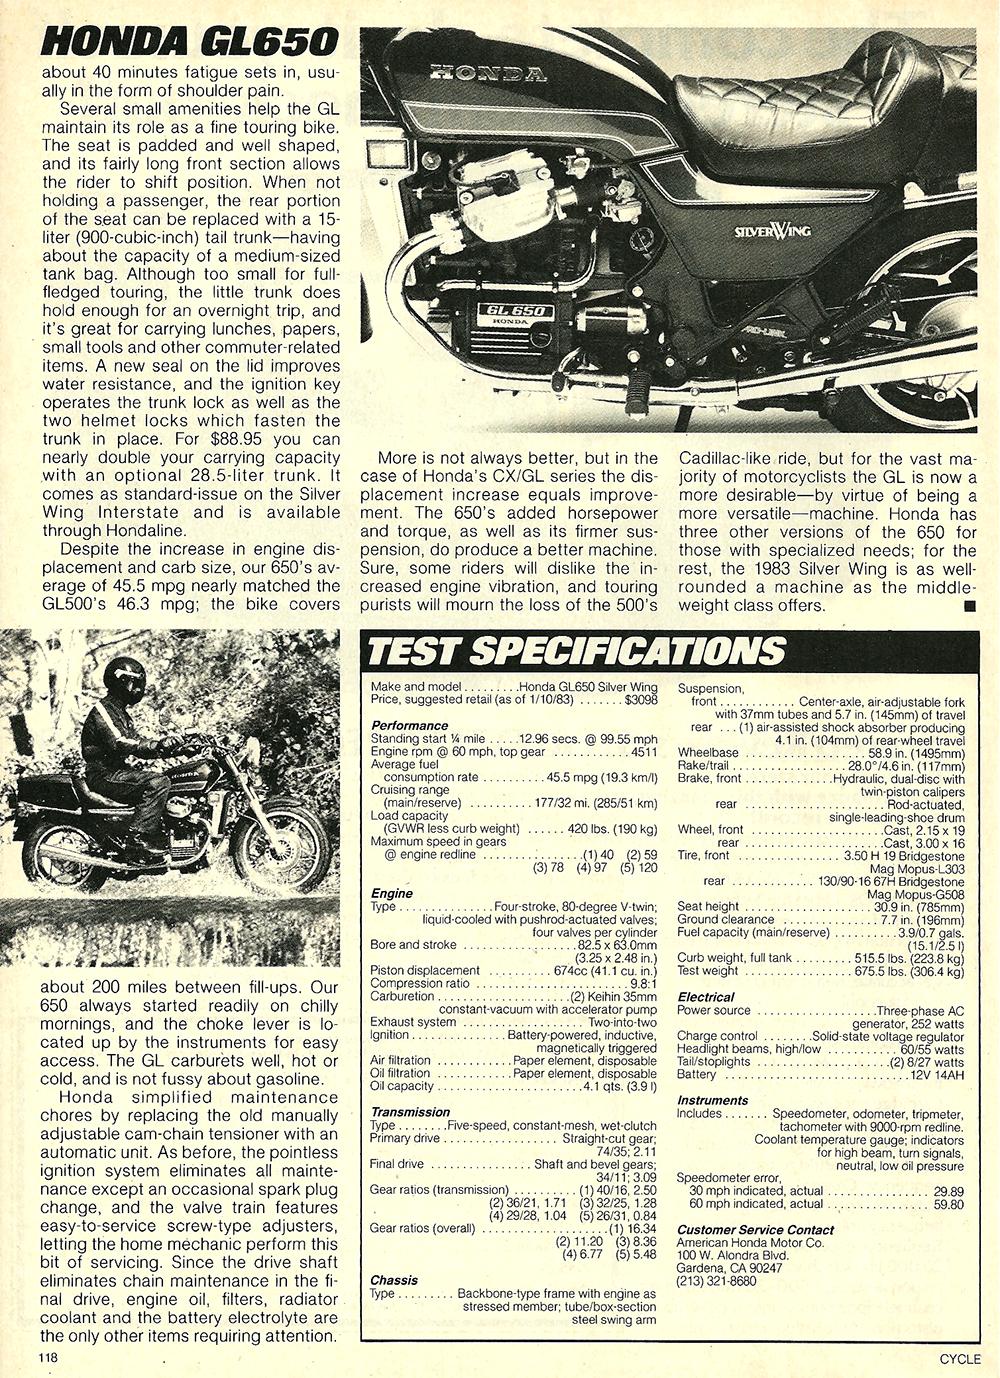 1983 Honda GL650 Silver Wing road test 7.jpg